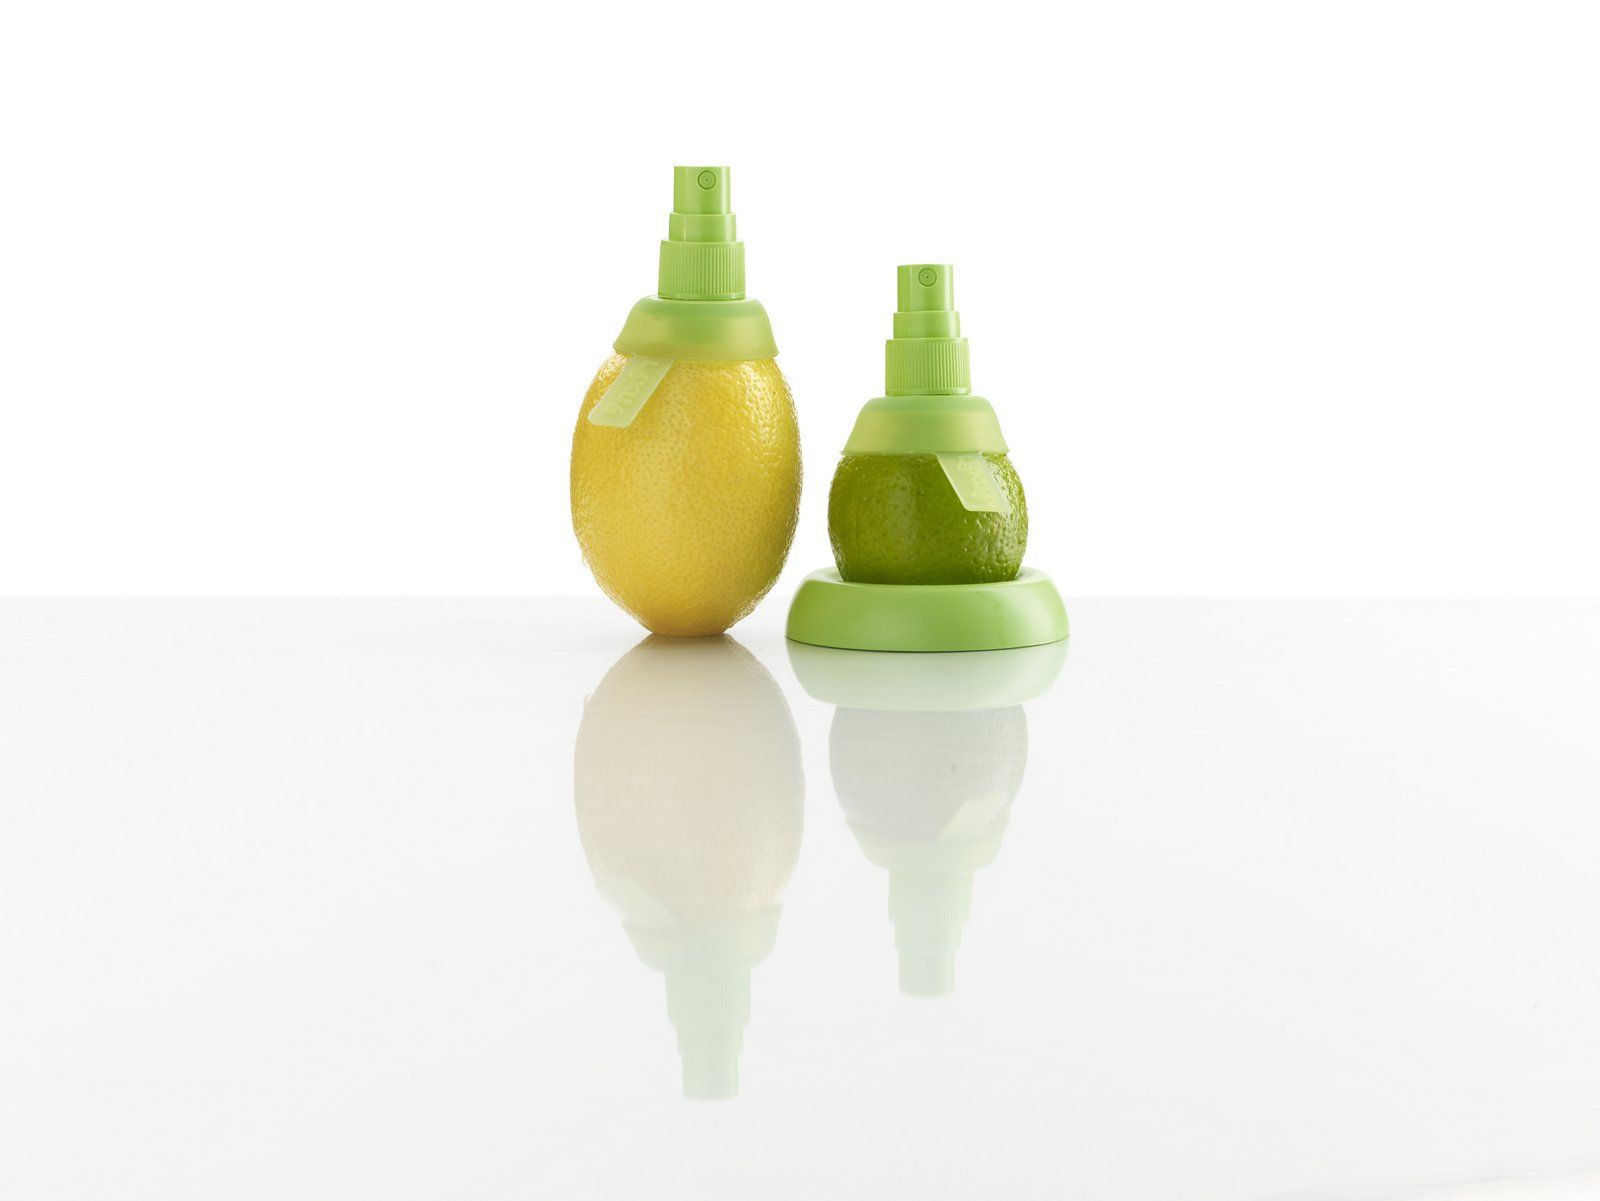 Küchengeräte / Lékué / Zitronenzerstäuber